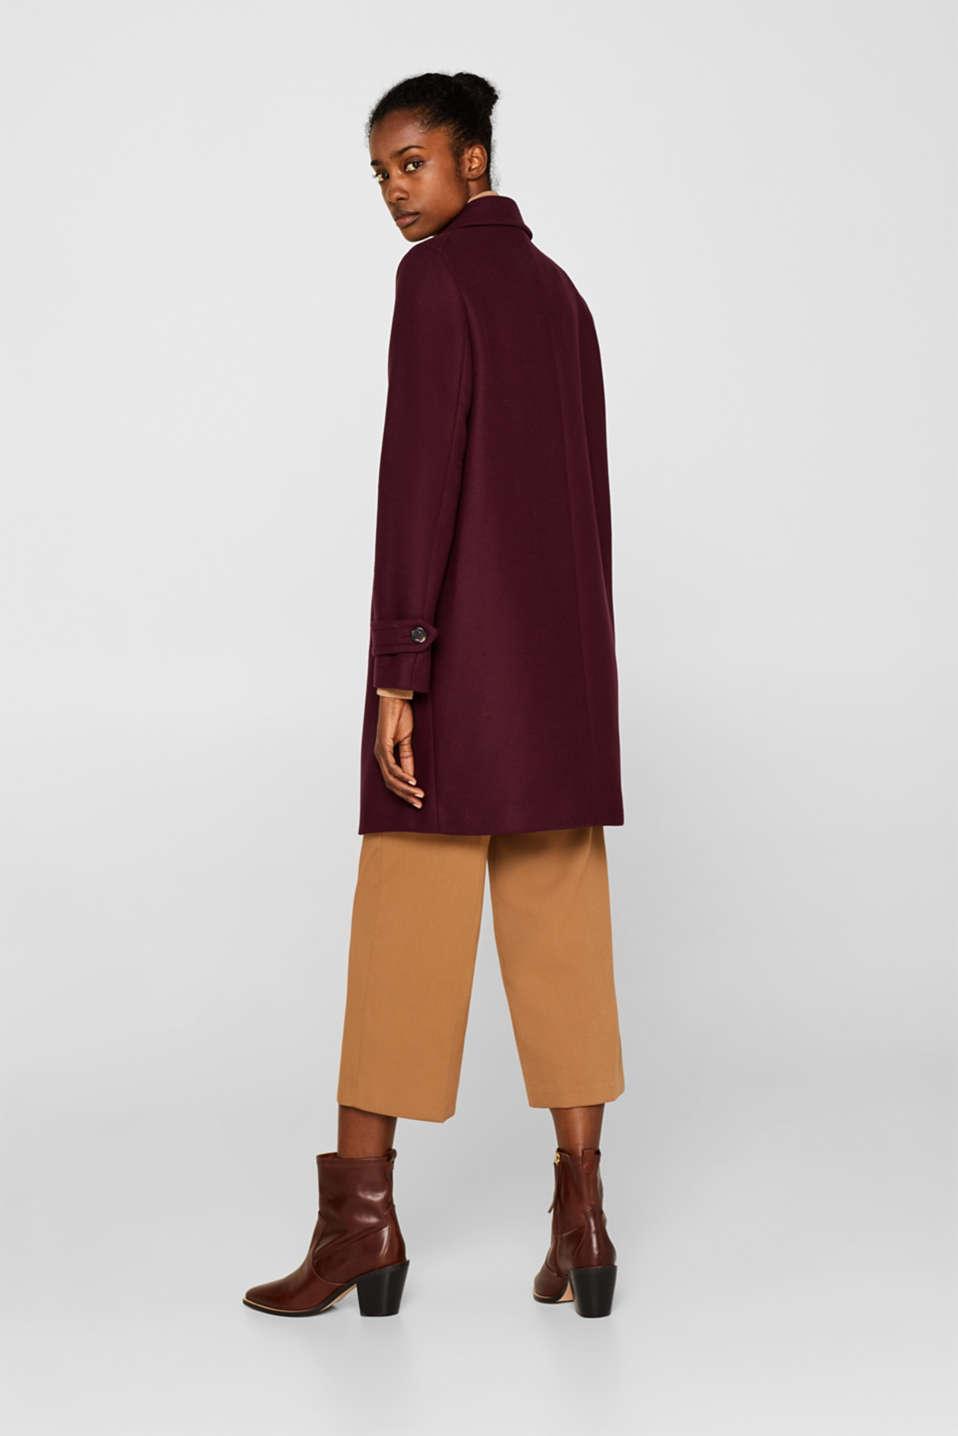 Wool blend coat, BORDEAUX RED, detail image number 3